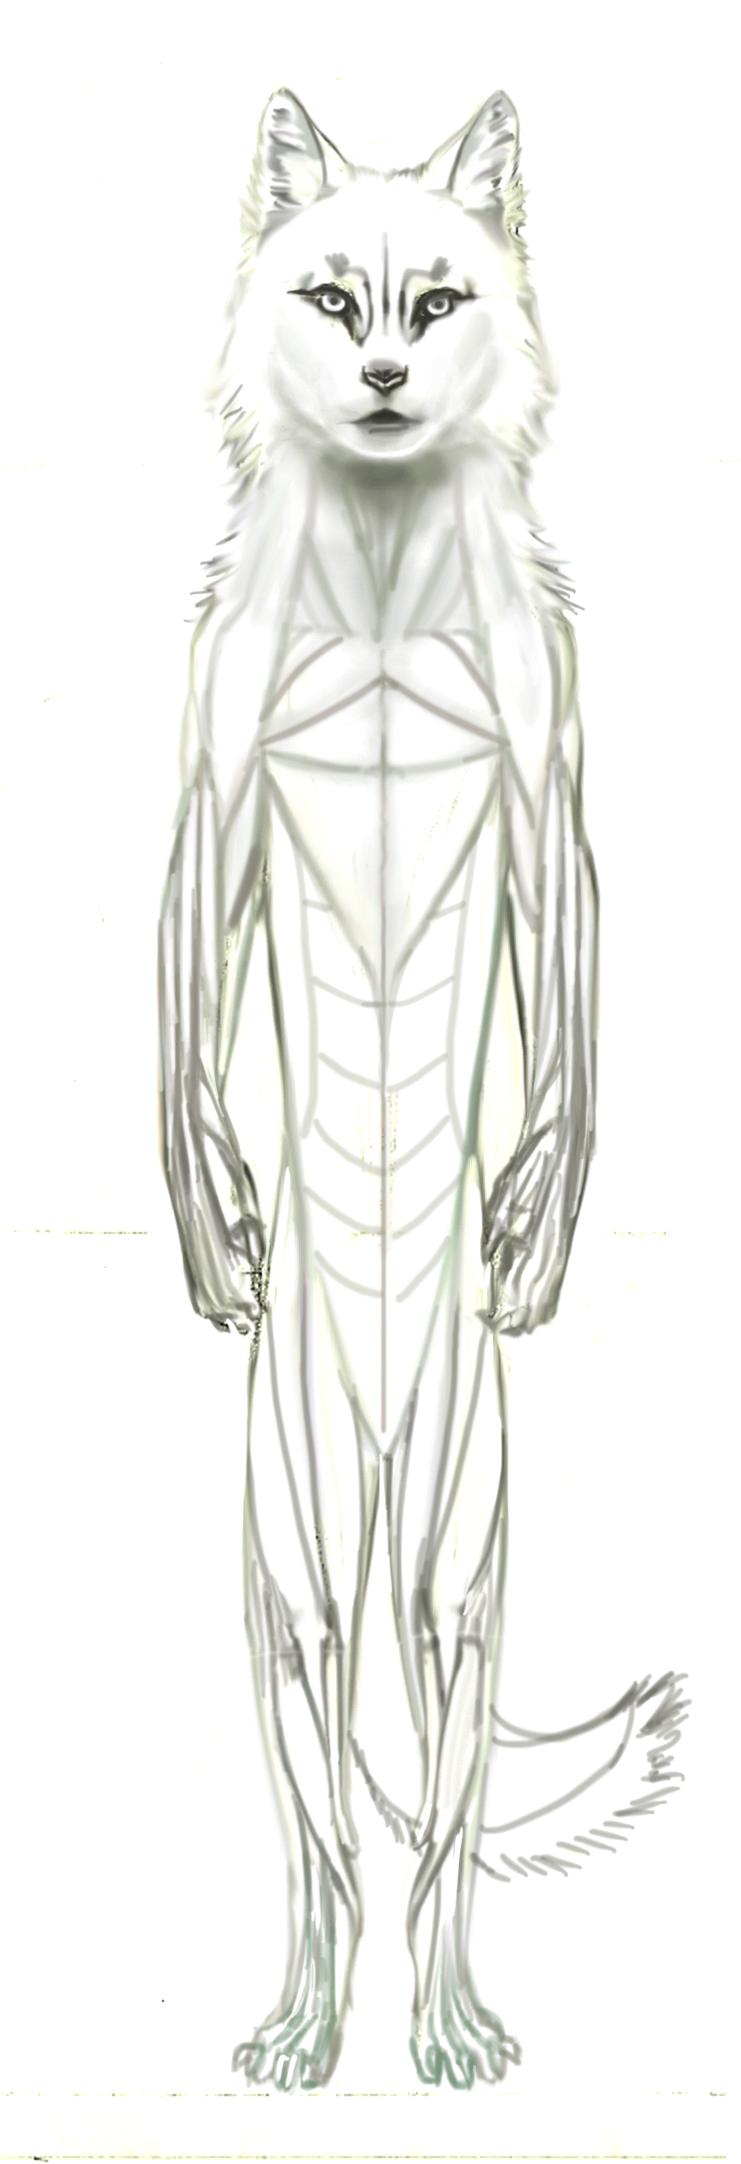 Volx Anatomy.jpg